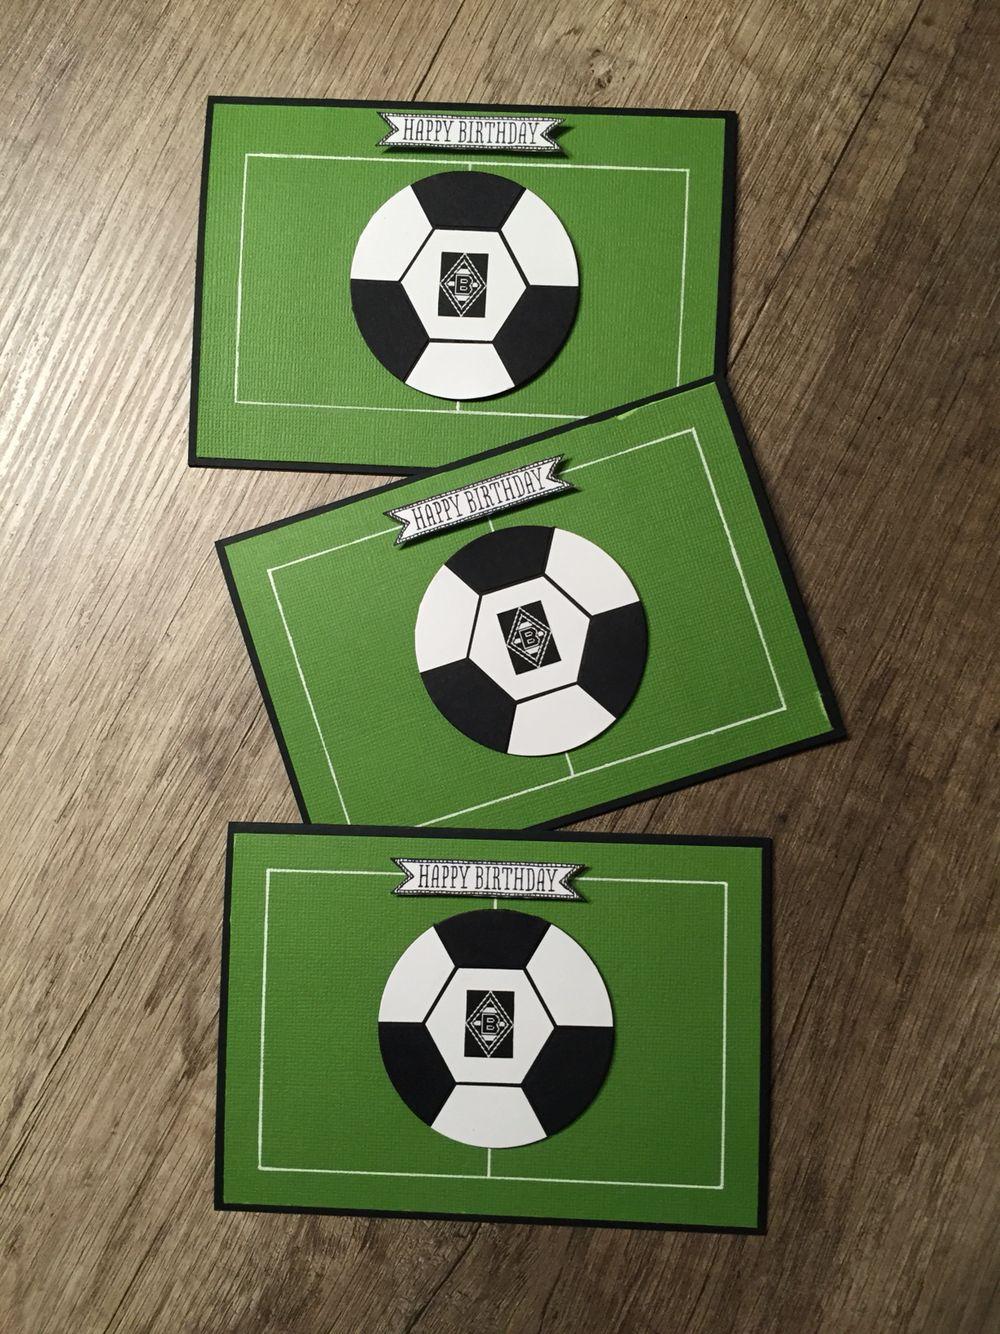 Geburtstag Fussball Borussia Monchengladbach Fussballkarten Karten Fussball Party